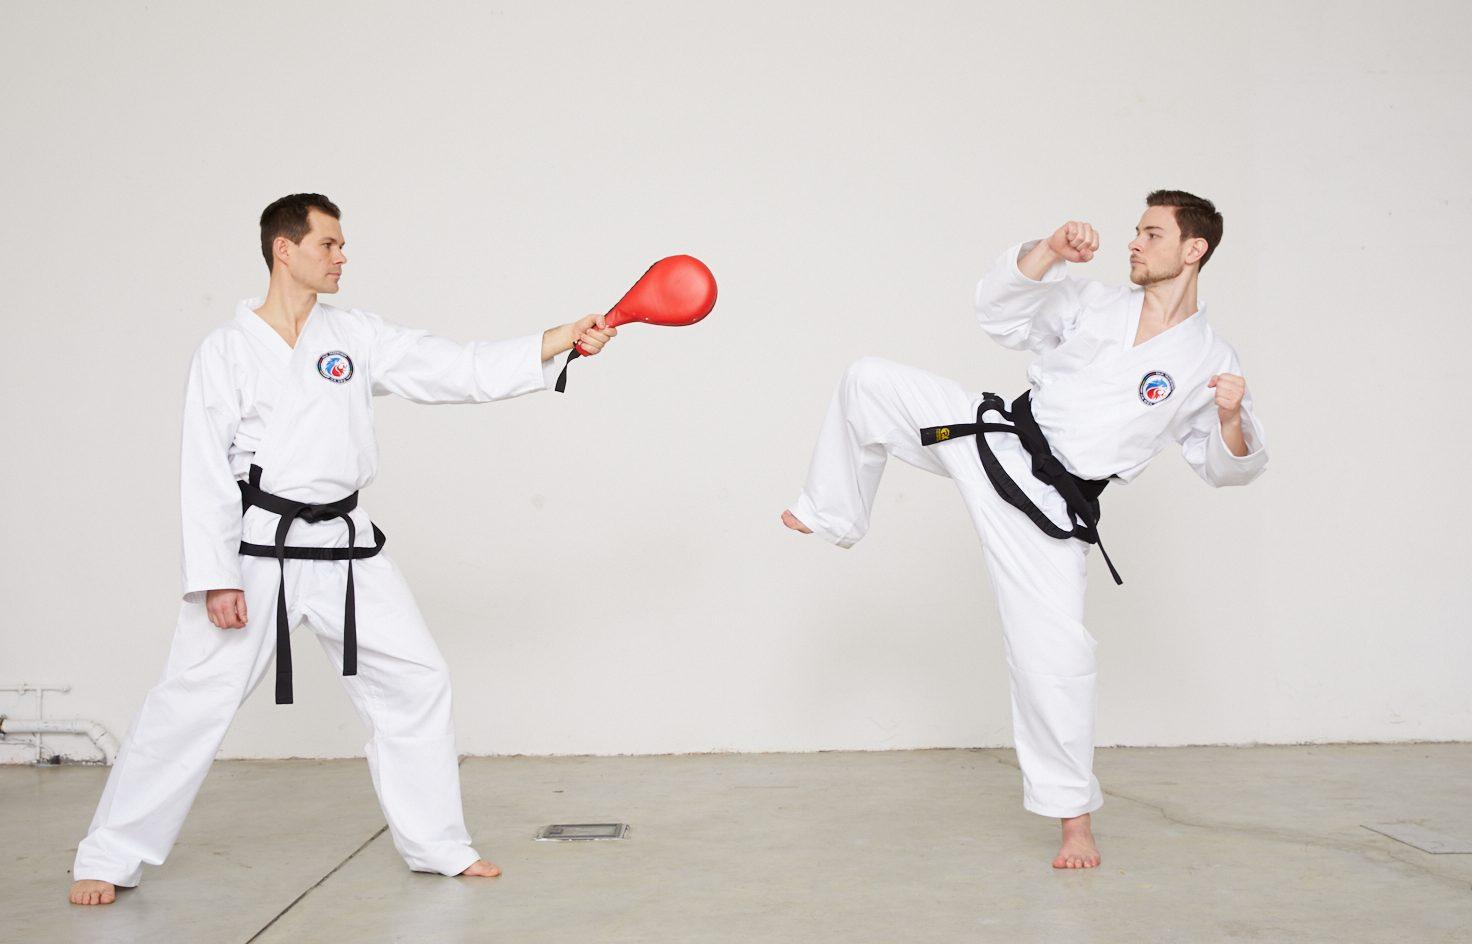 Taekwondo-Kick auf Schlagpolster - Teill 3